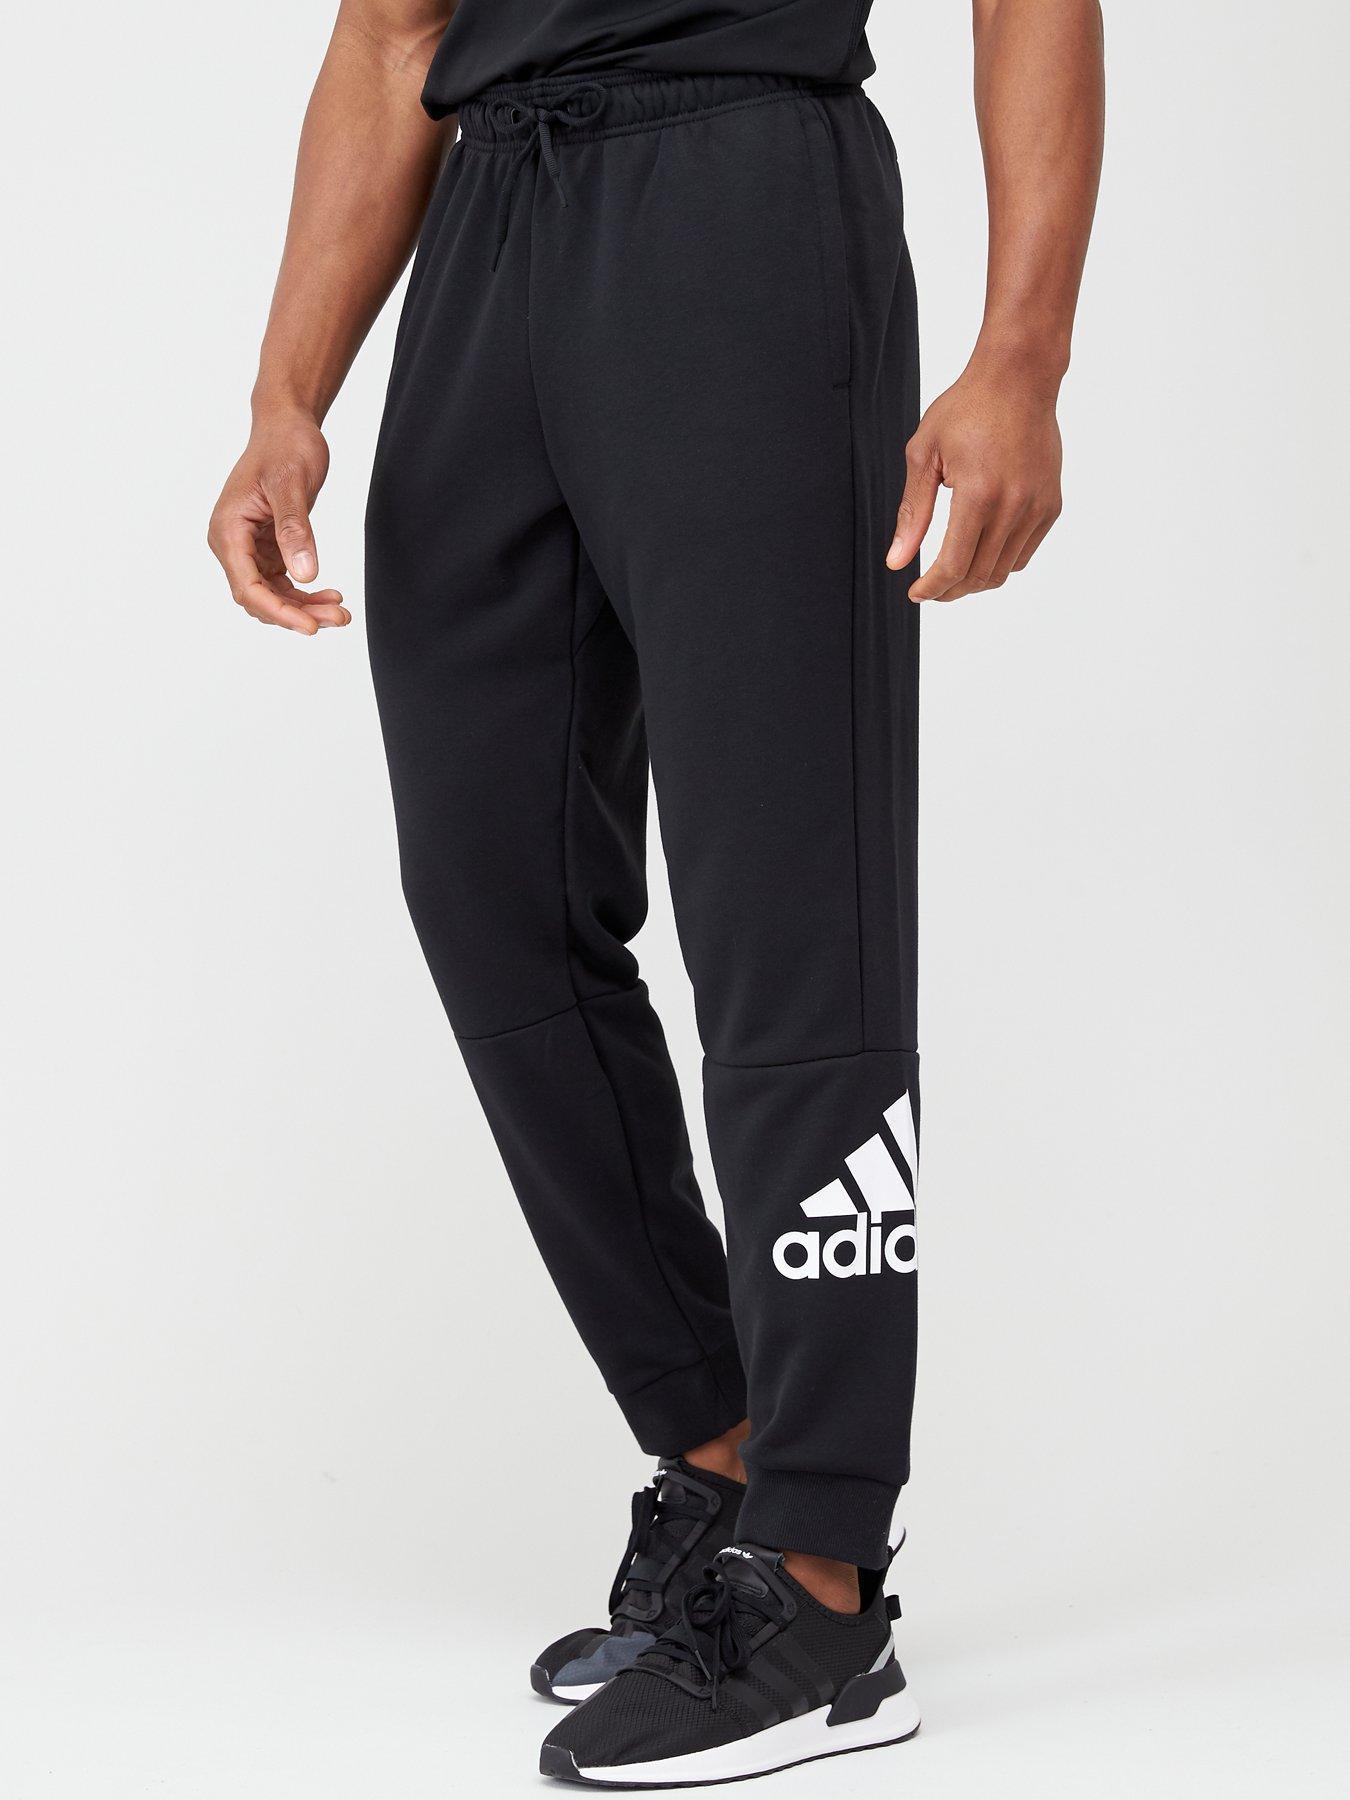 jogging 3xl adidas